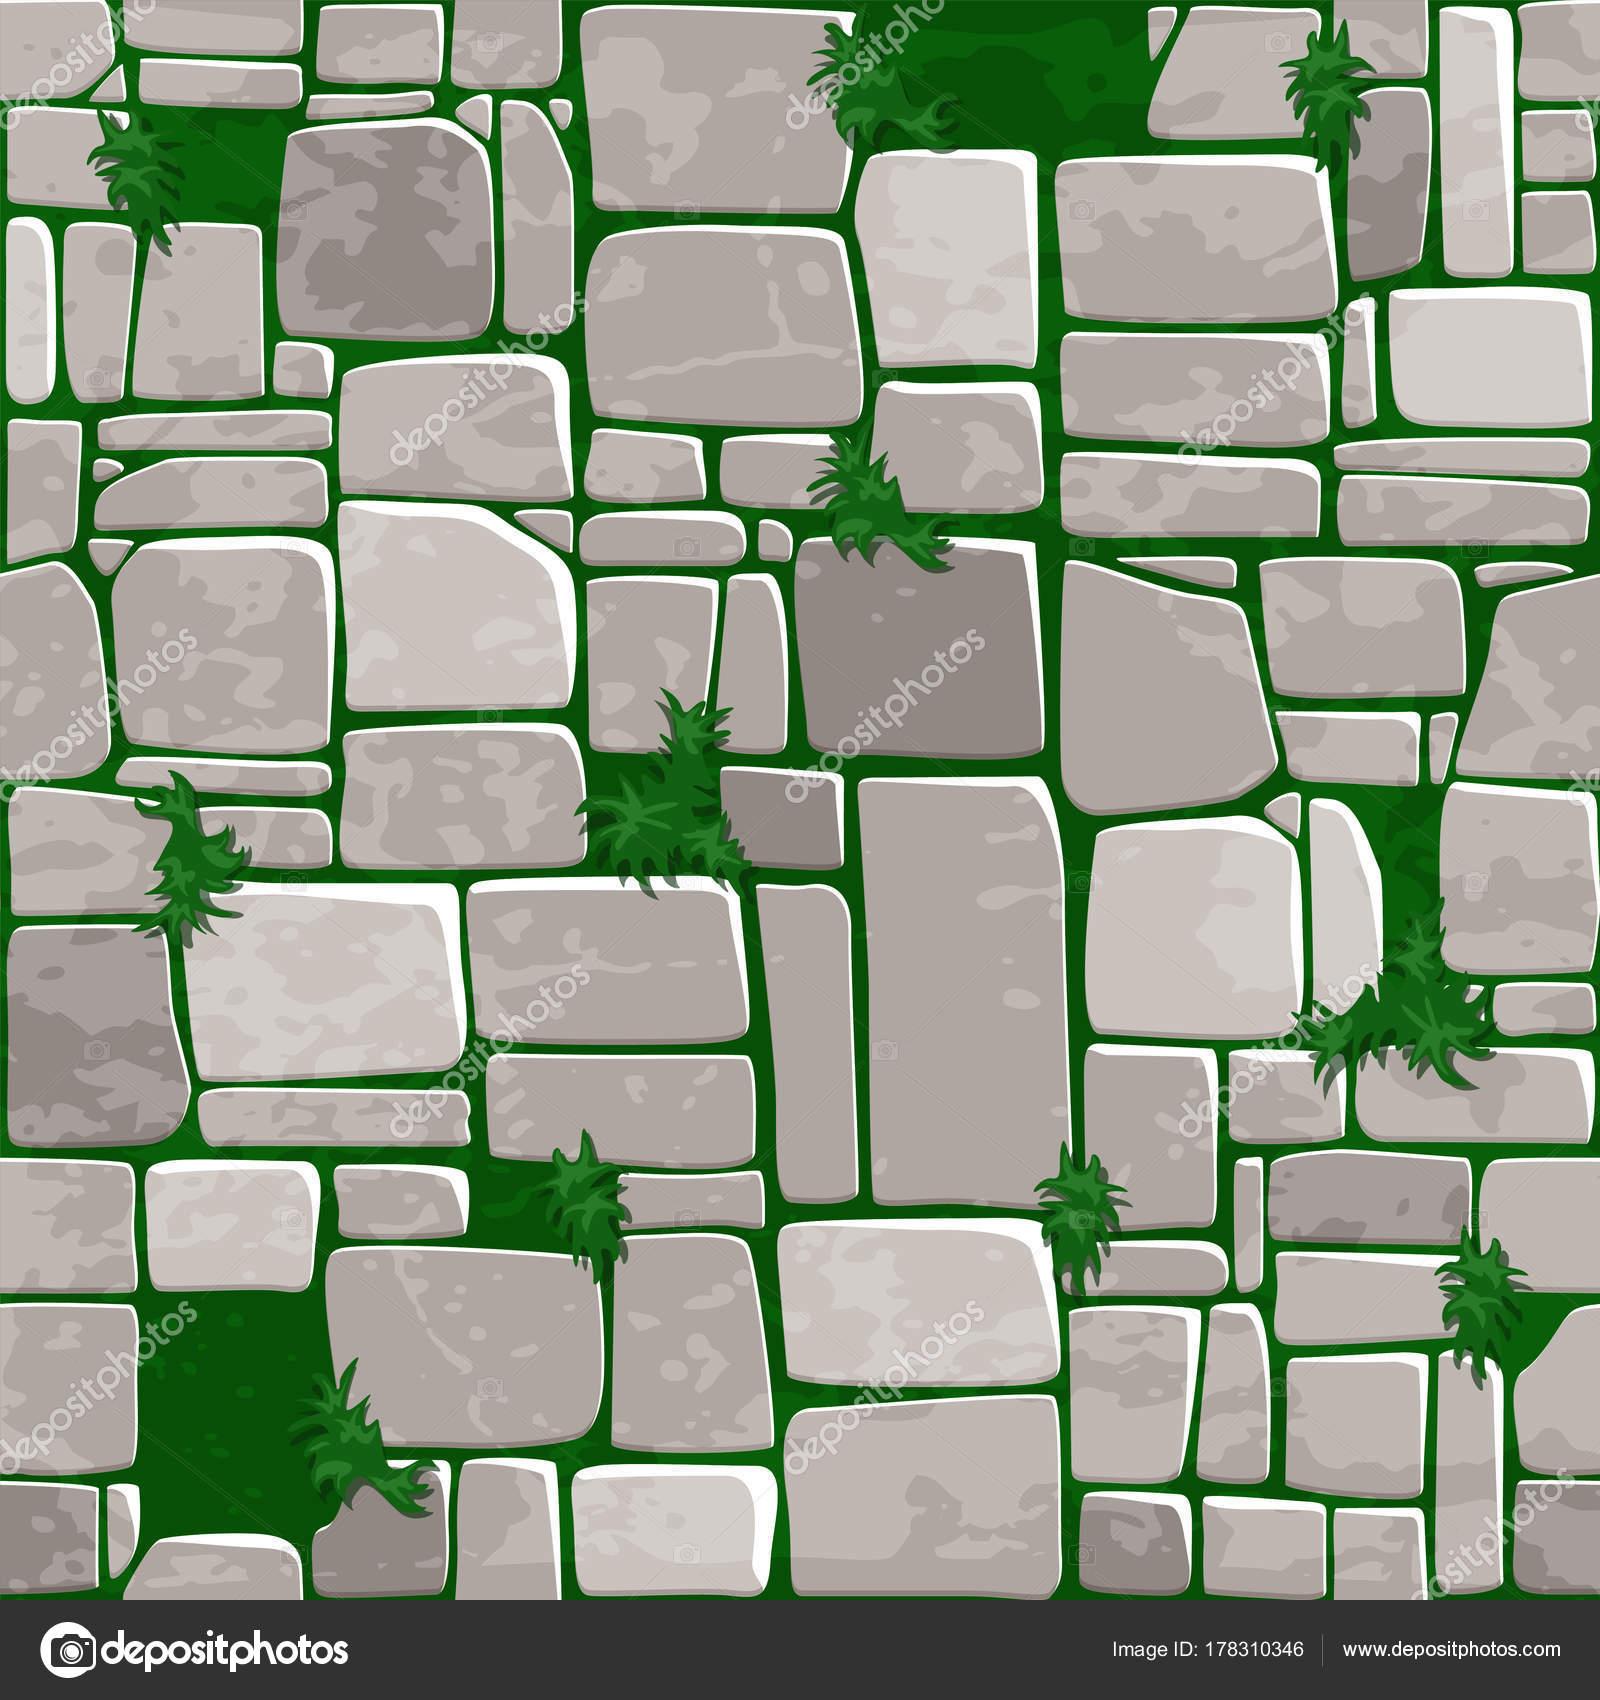 cartoon seamless background texture grey stone on grass vector illustration for ui game element u2014 by babysofjagmailcom grass game29 grass